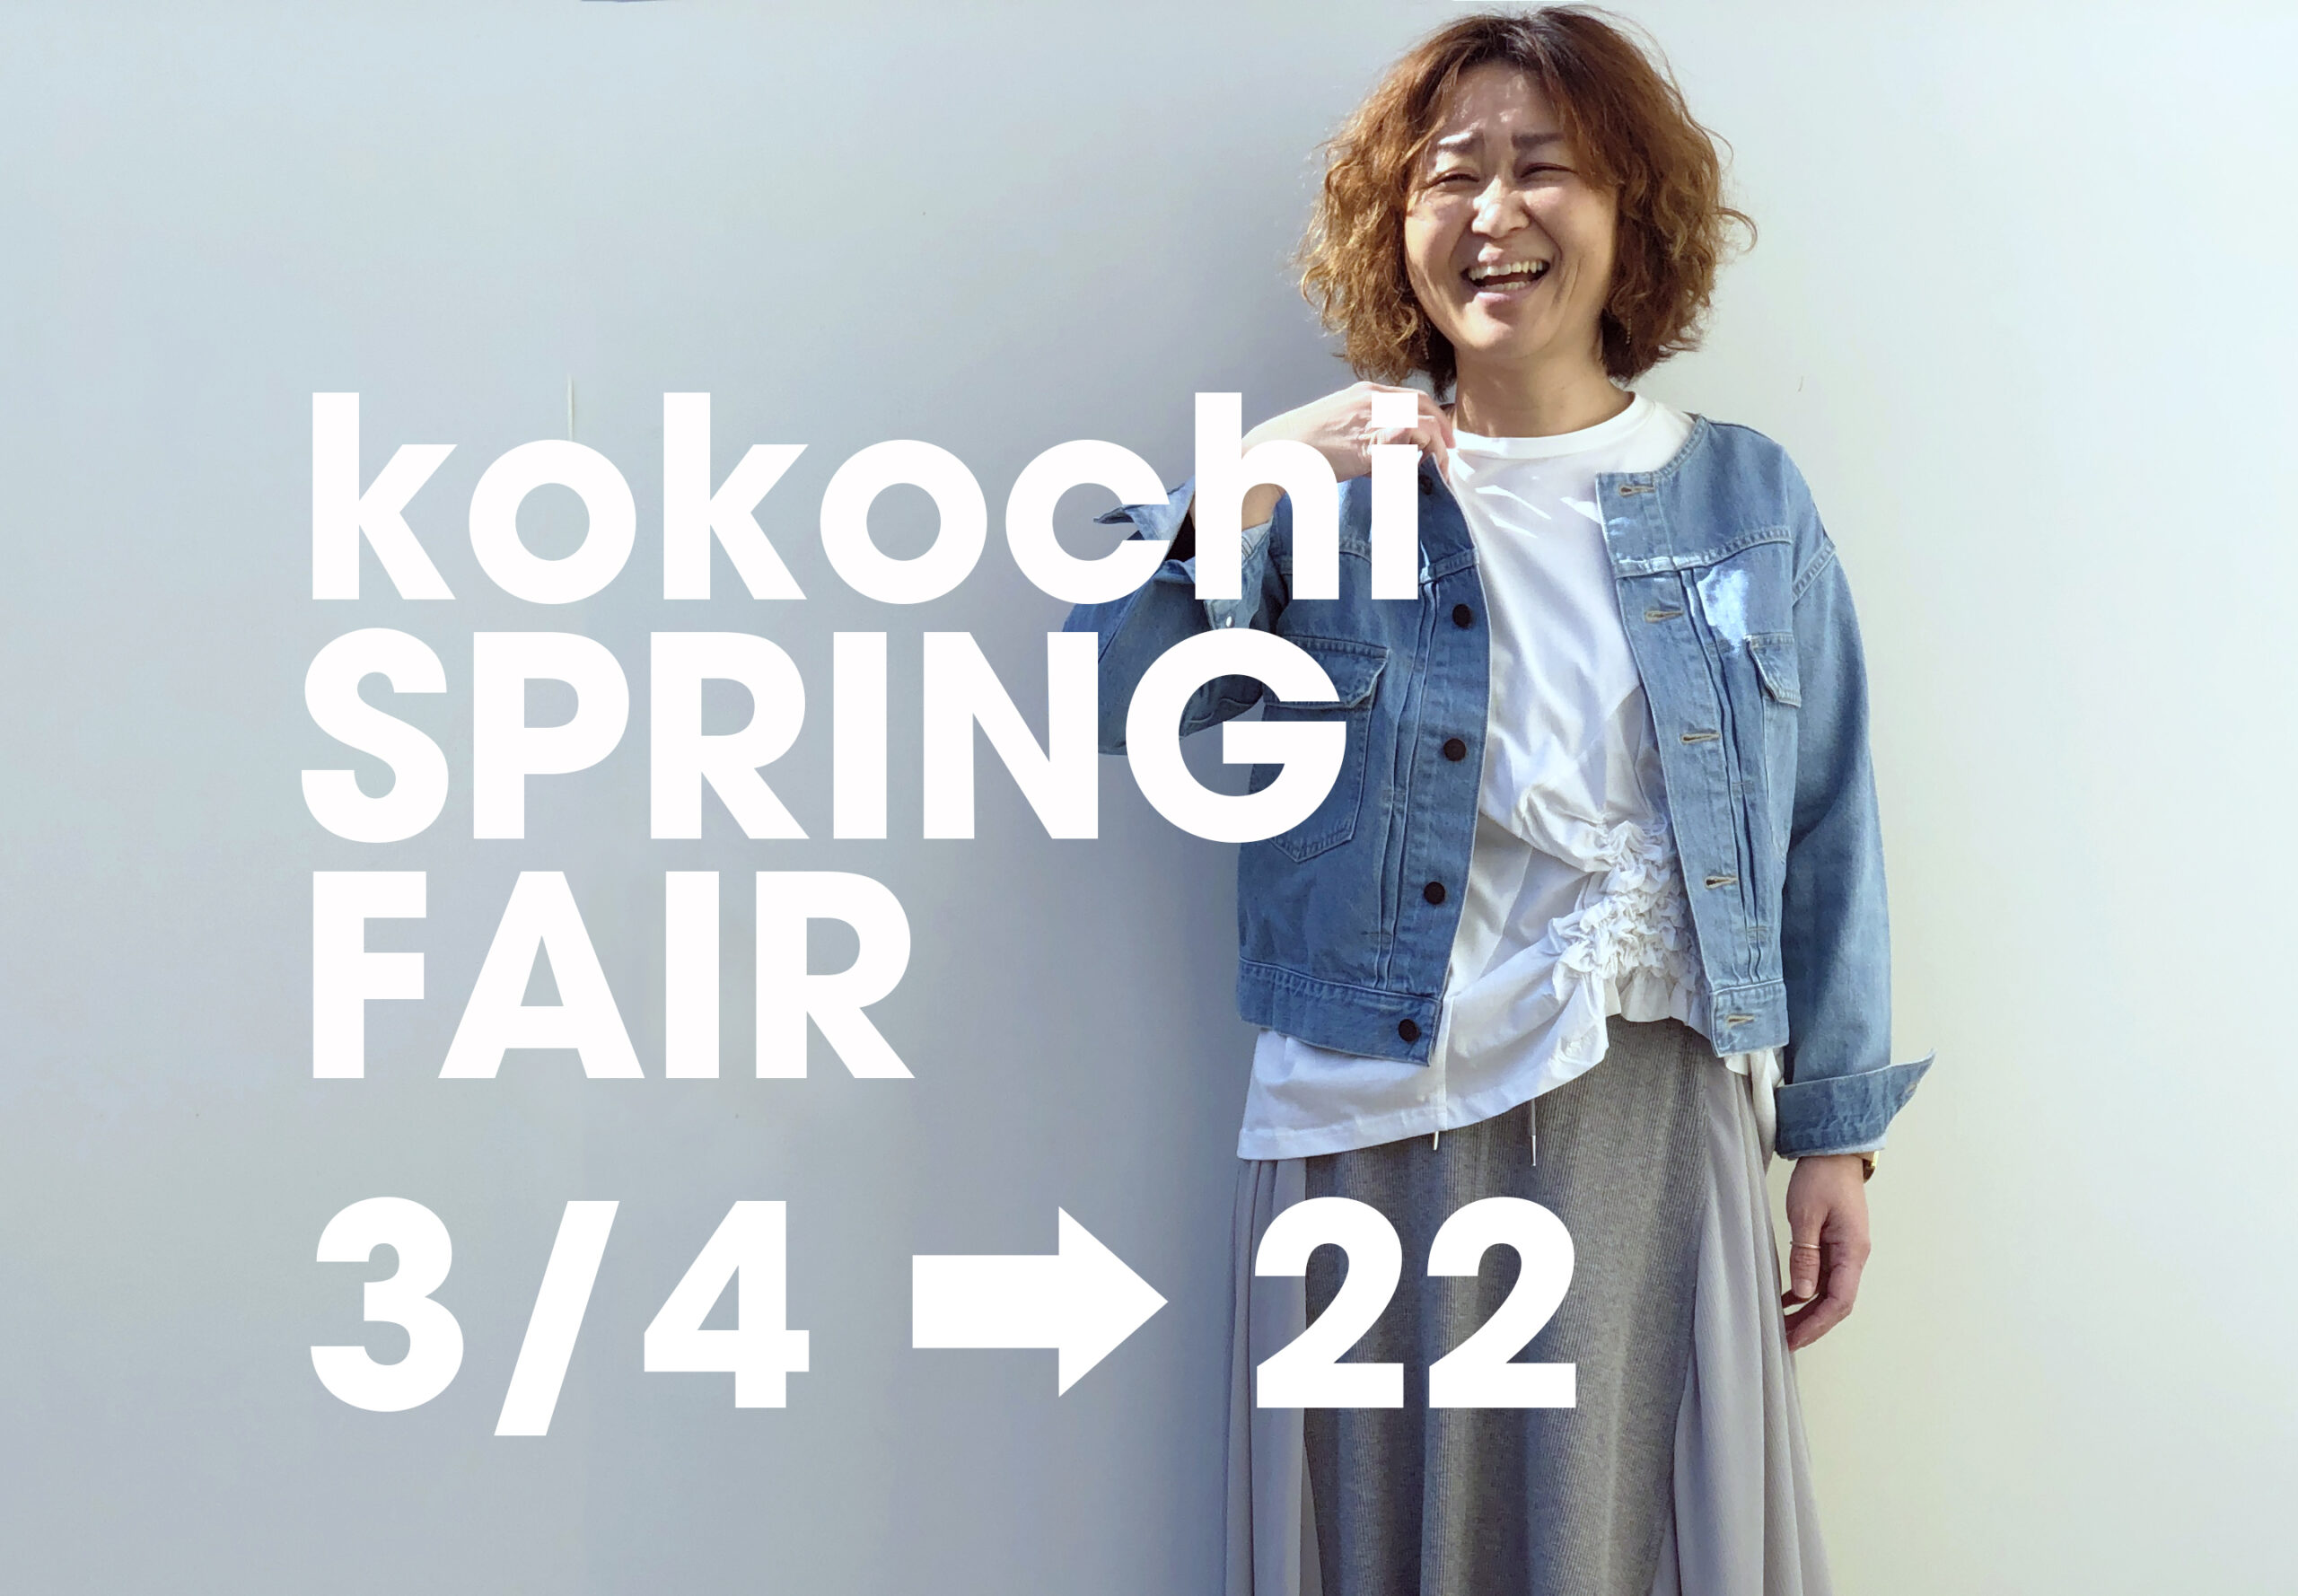 kokochi長浜2021spring fair